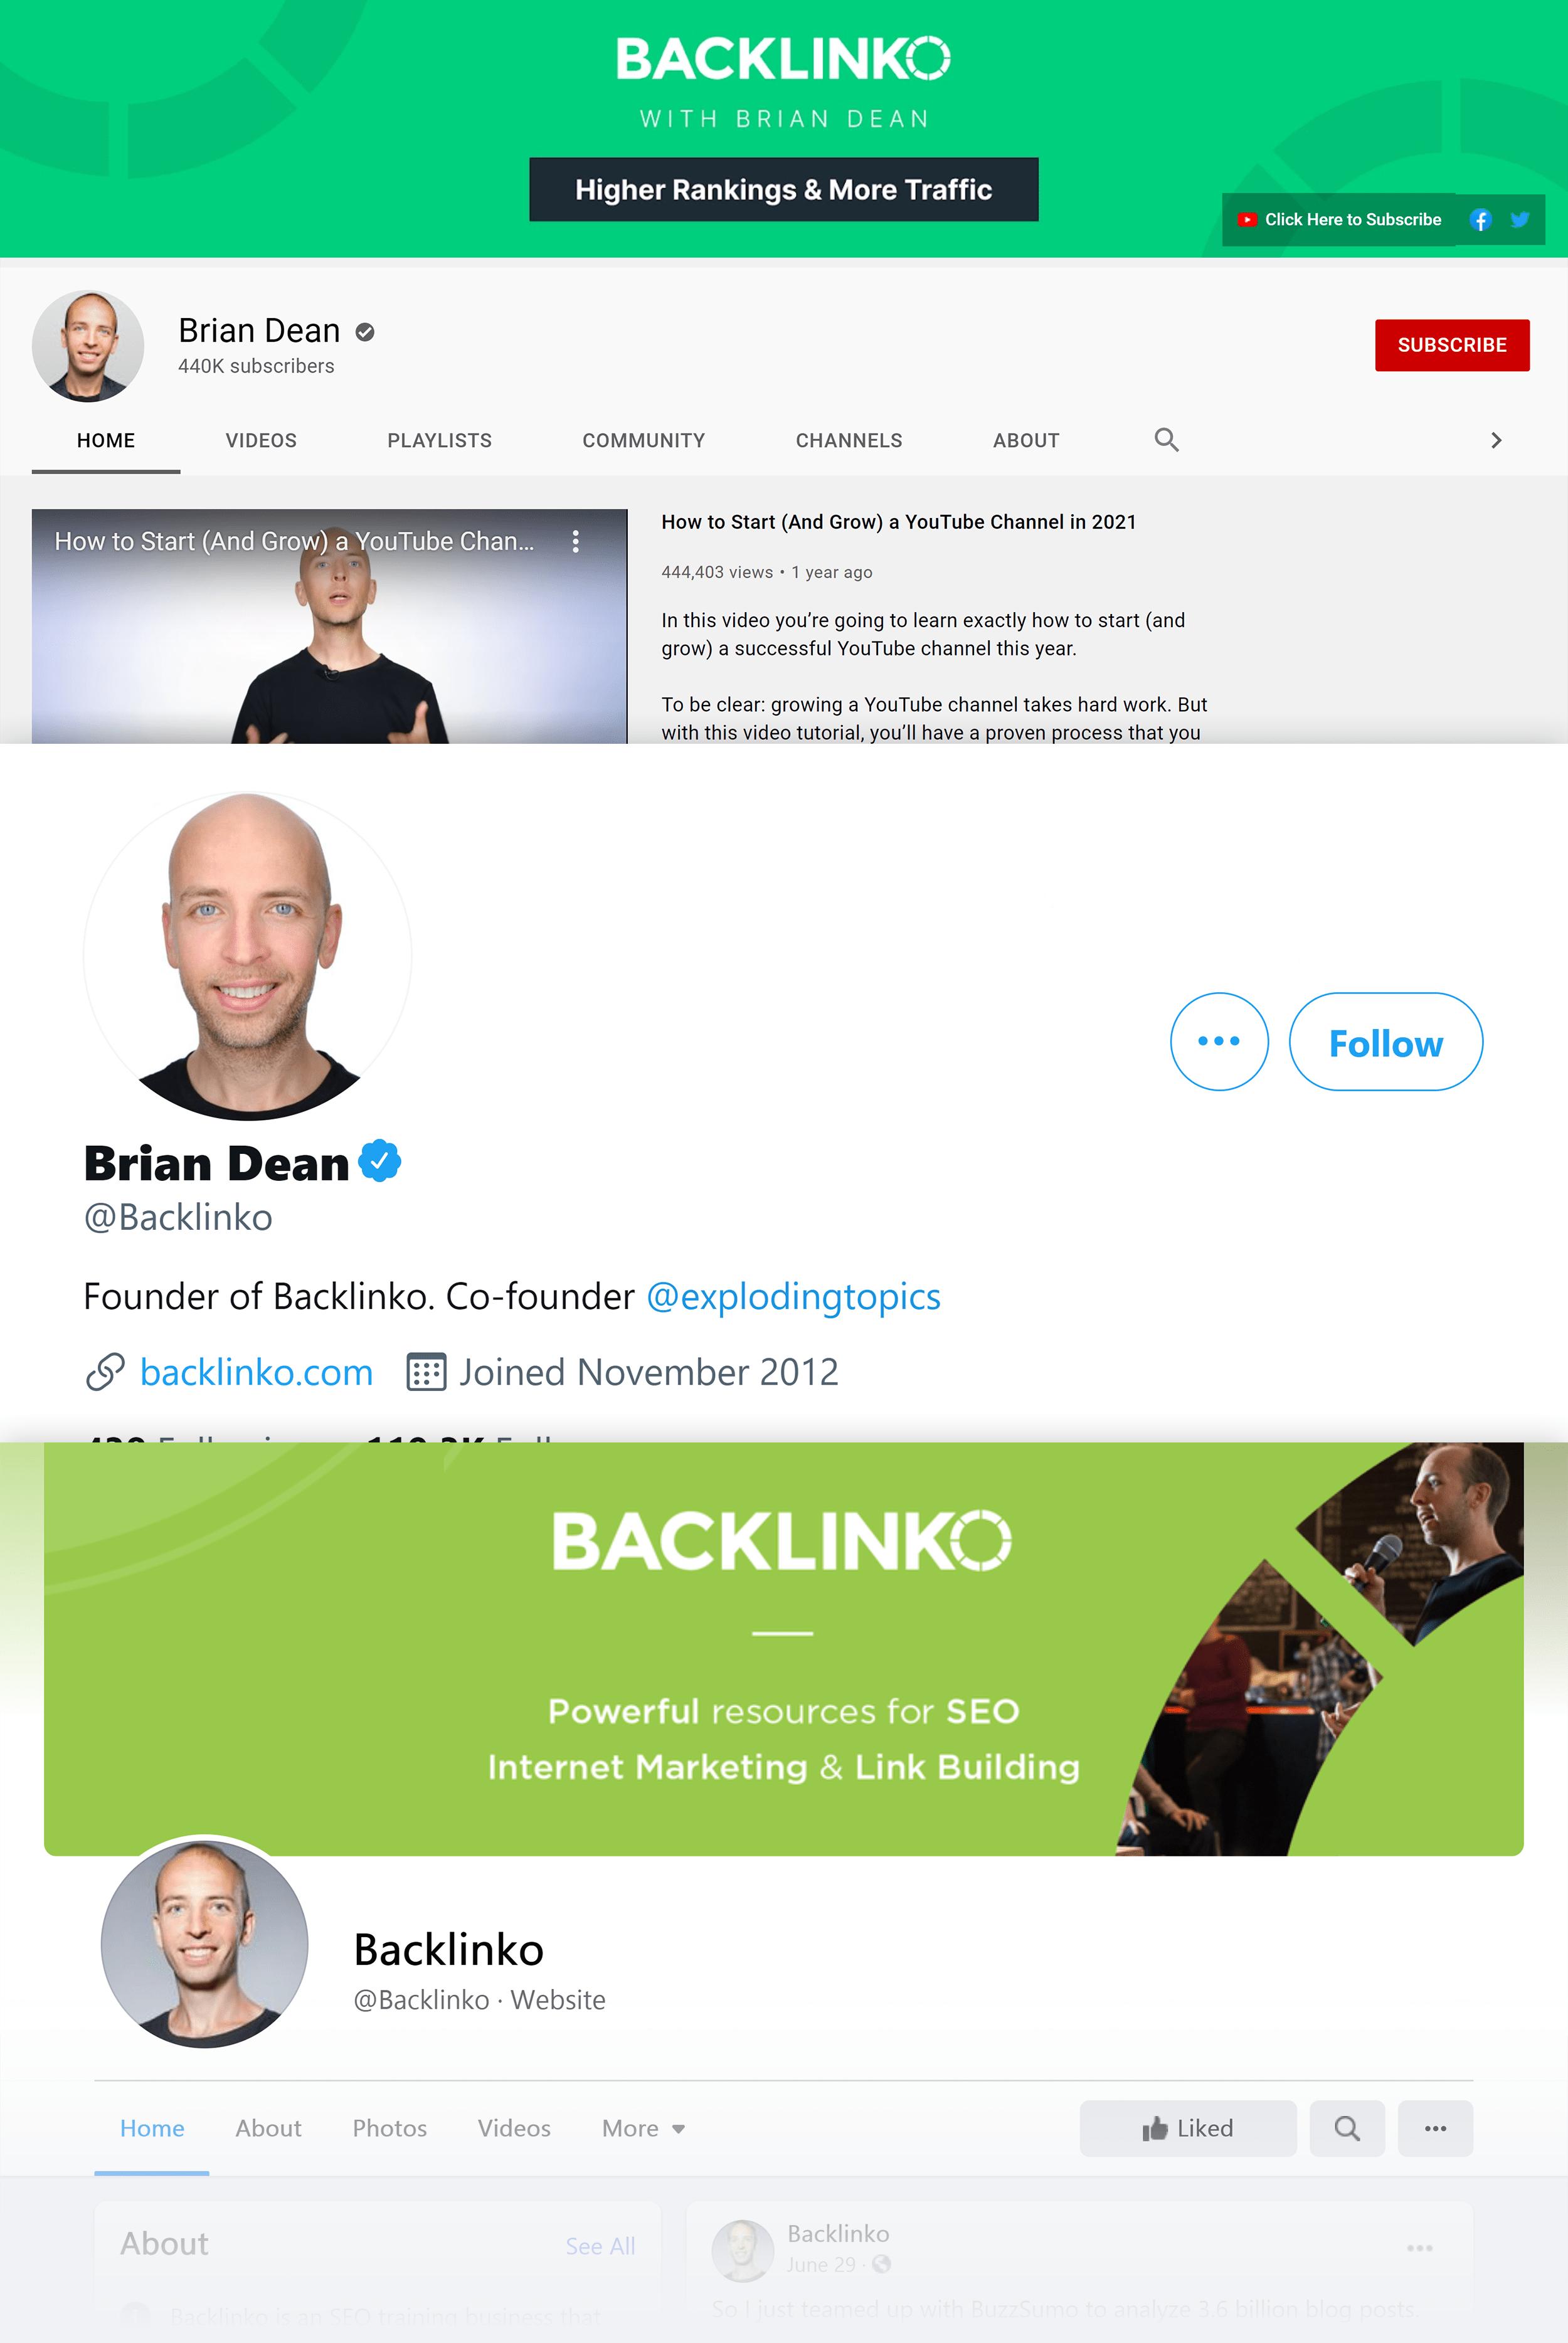 Backlinko social networks